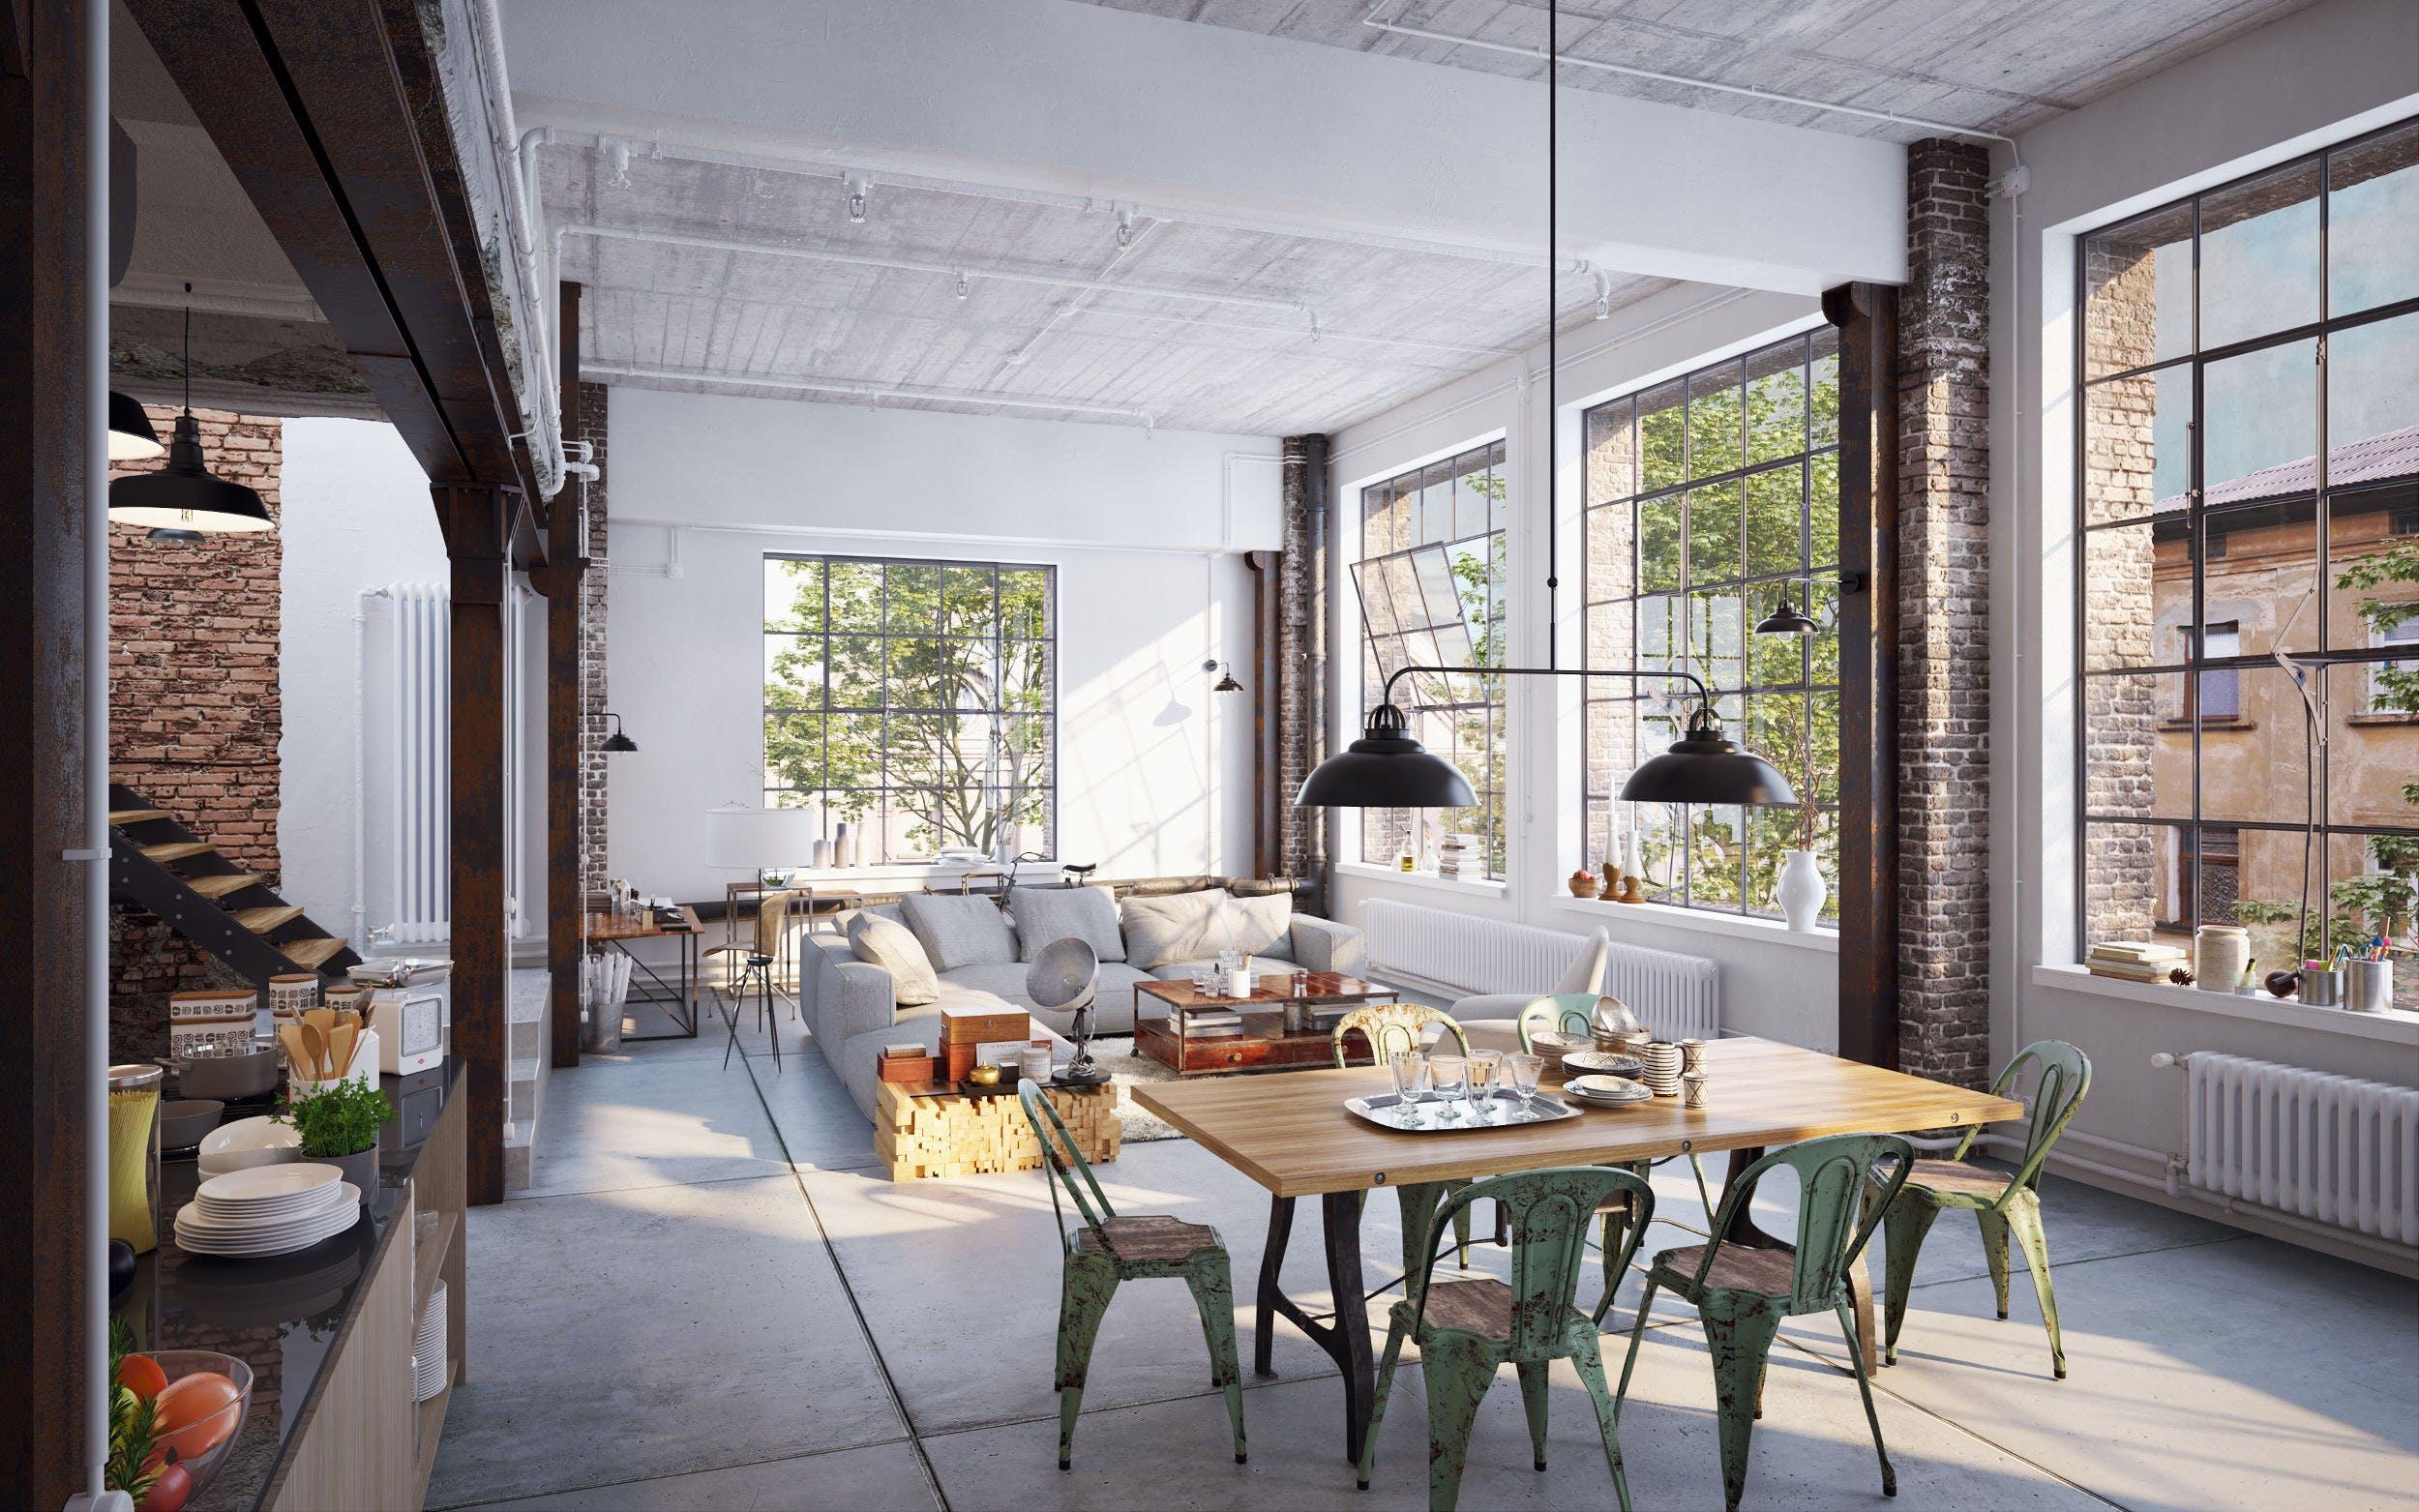 Image of shutterstock 638582218 1 in Industrial style in interior design - Cosentino